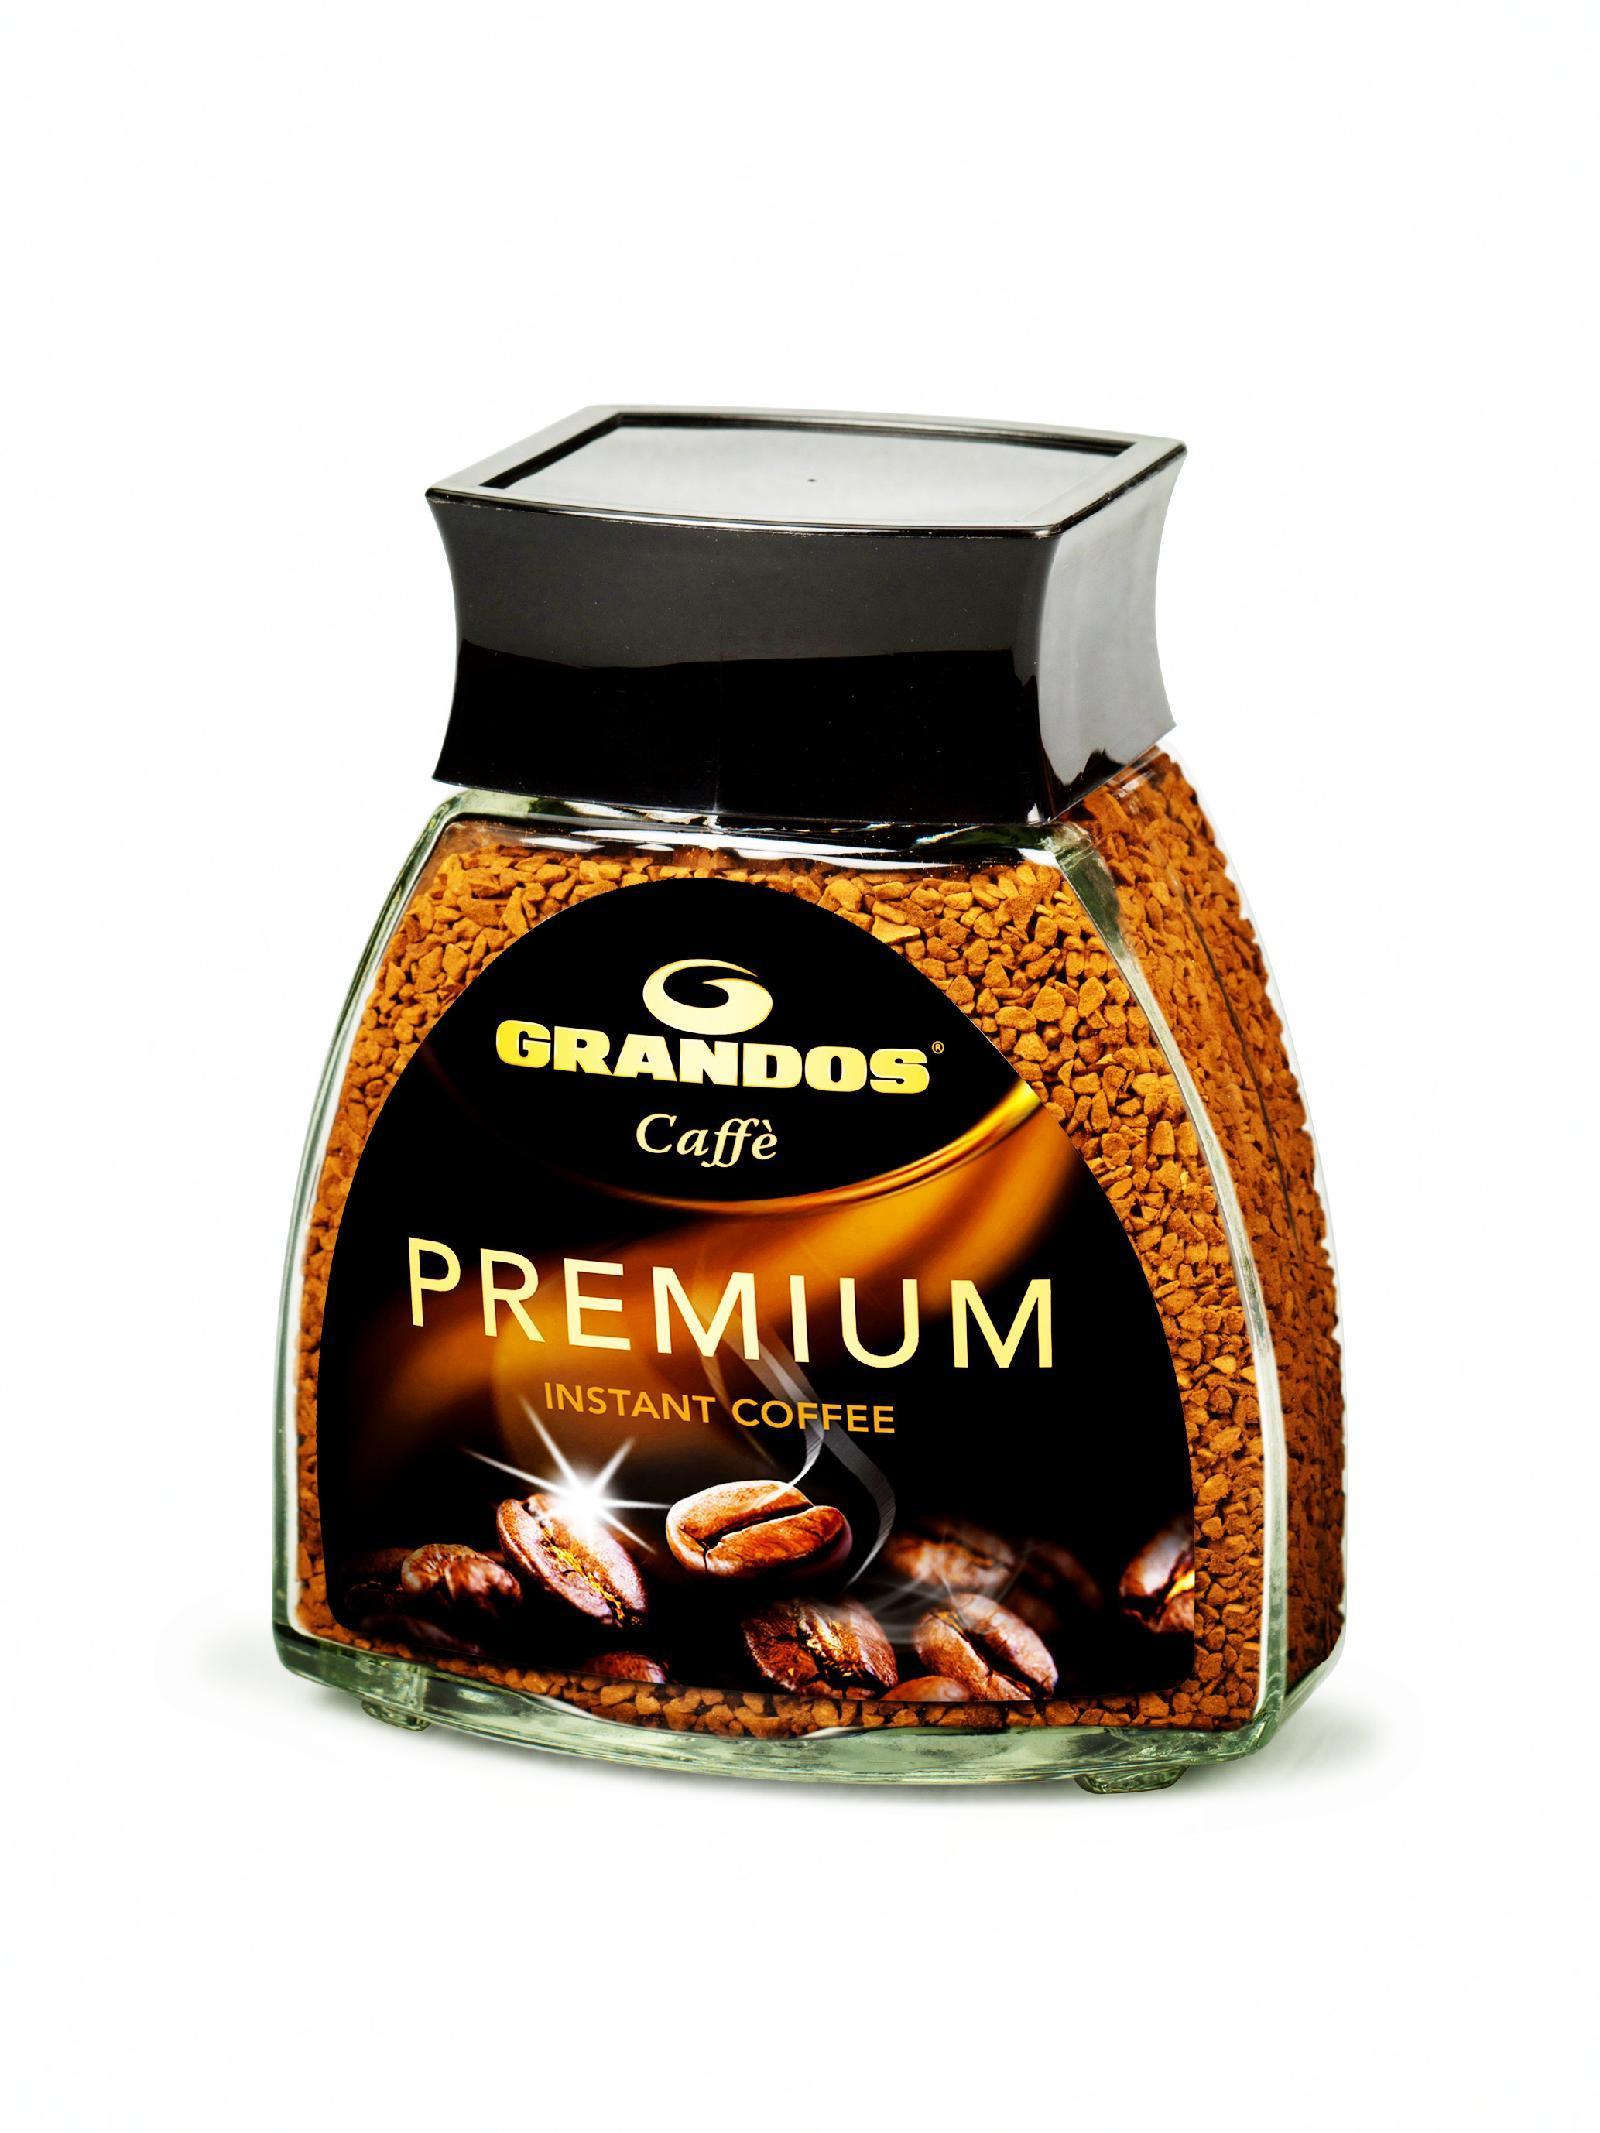 Grandos Premium 格兰特特级速溶咖啡